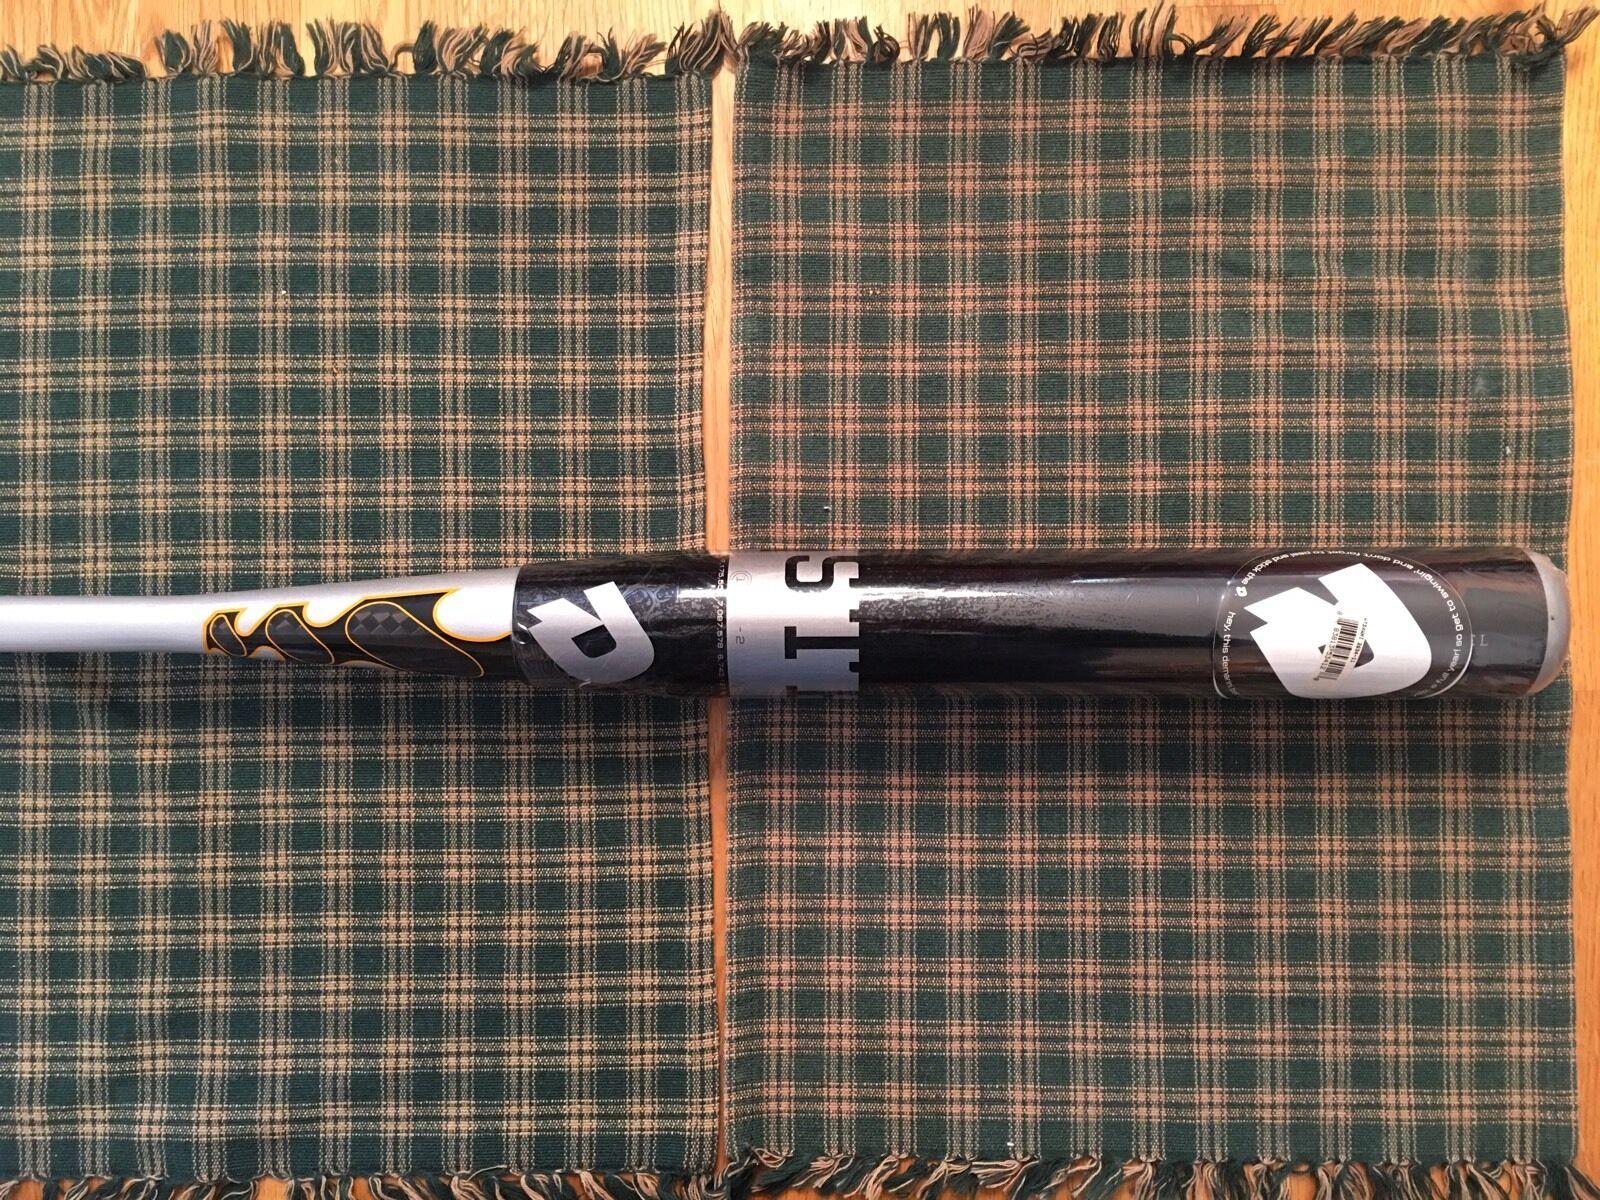 RARE NIW 2011 DEMARINI WHITE STEEL 34 26 Slowpitch Softball Bat WHI-11 ASA HOT